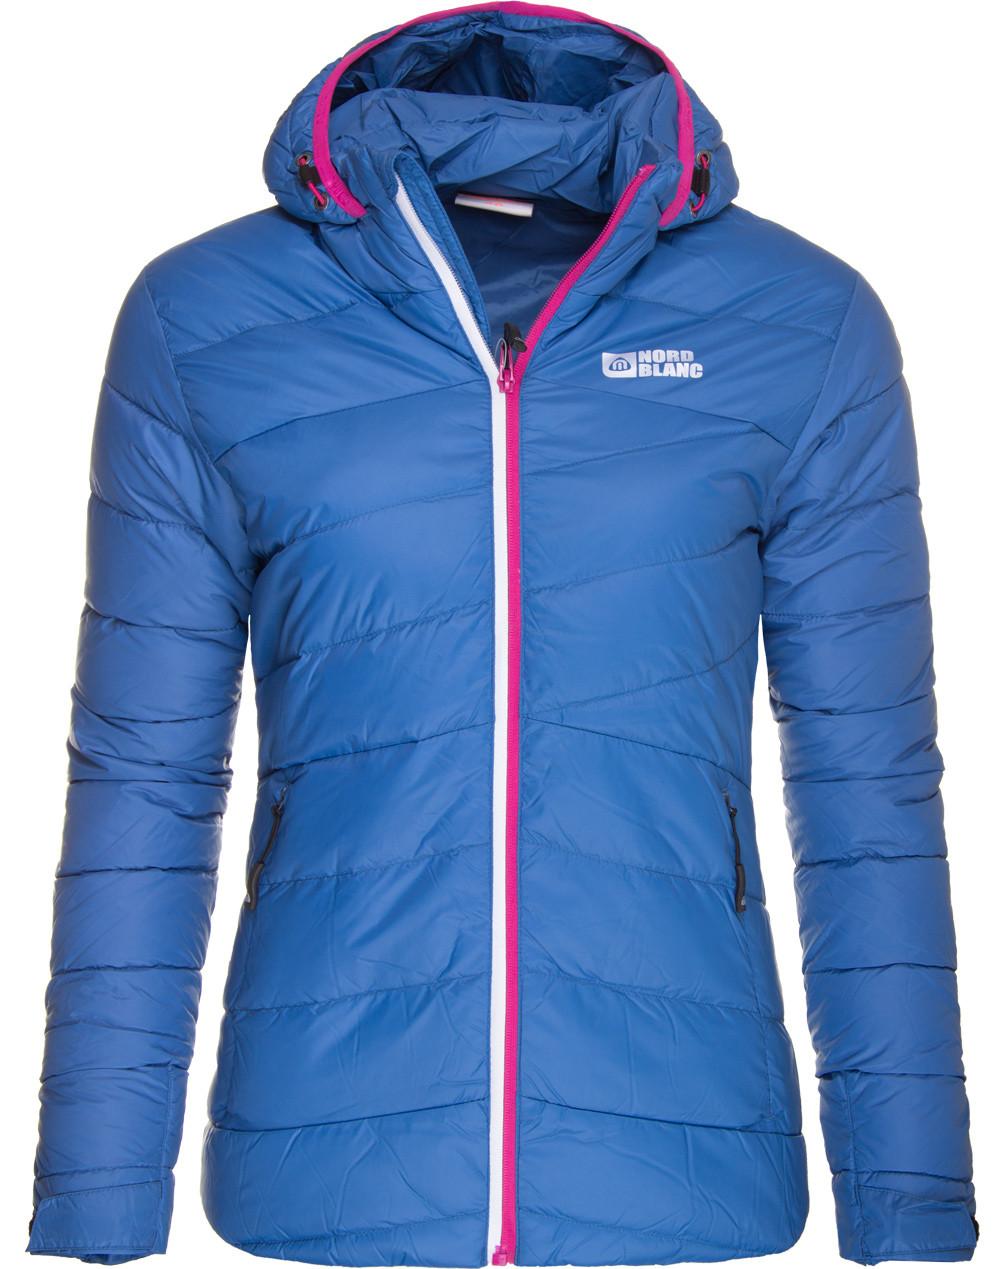 uk availability 22b60 0e46e Winter feather jacket NORDBLANC Purpote - NBWJL5840 - ALIATIC